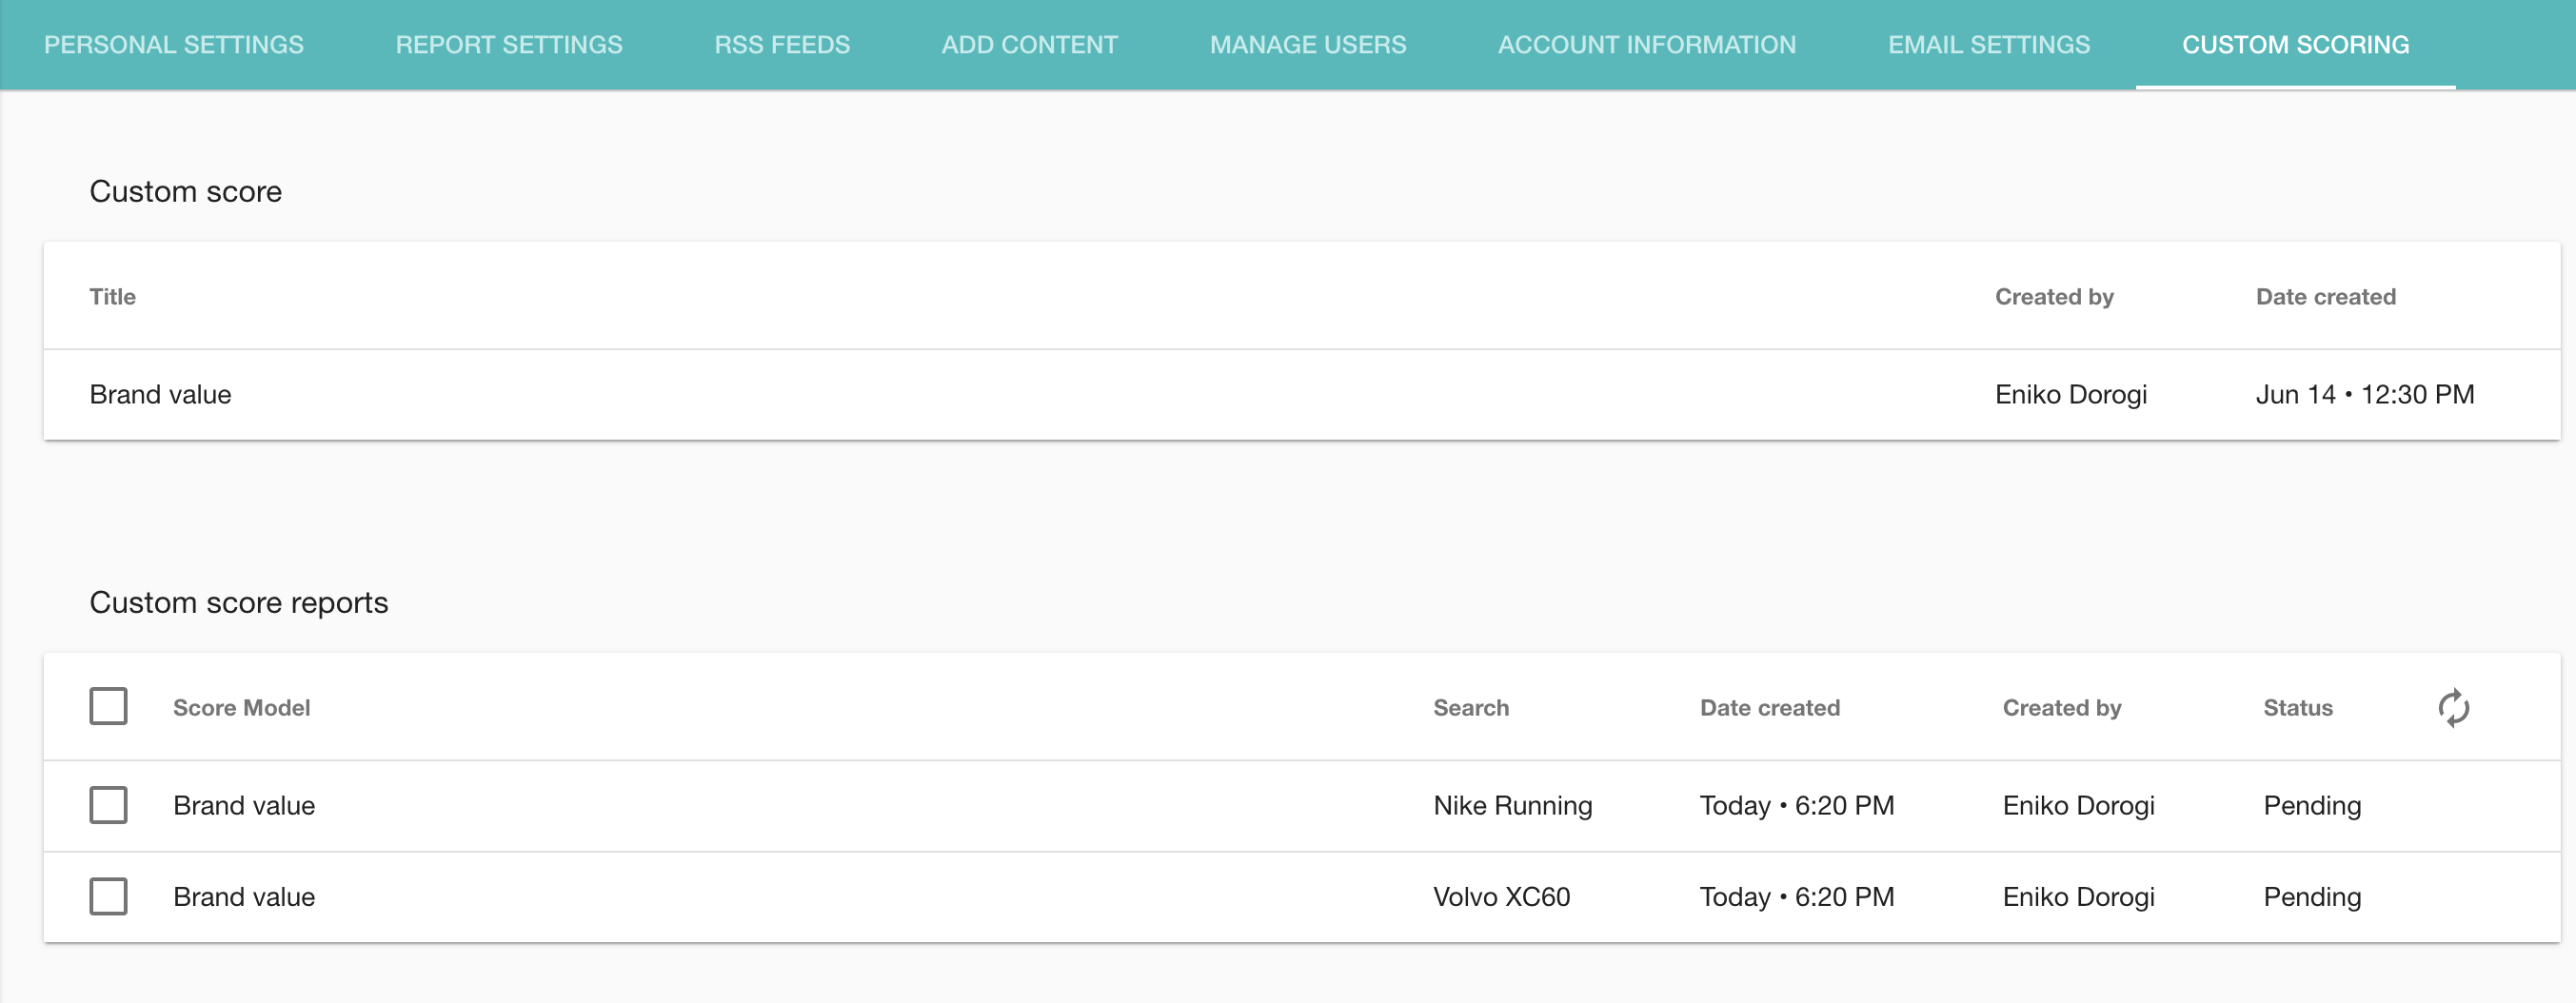 saved_custom_score_reports.png